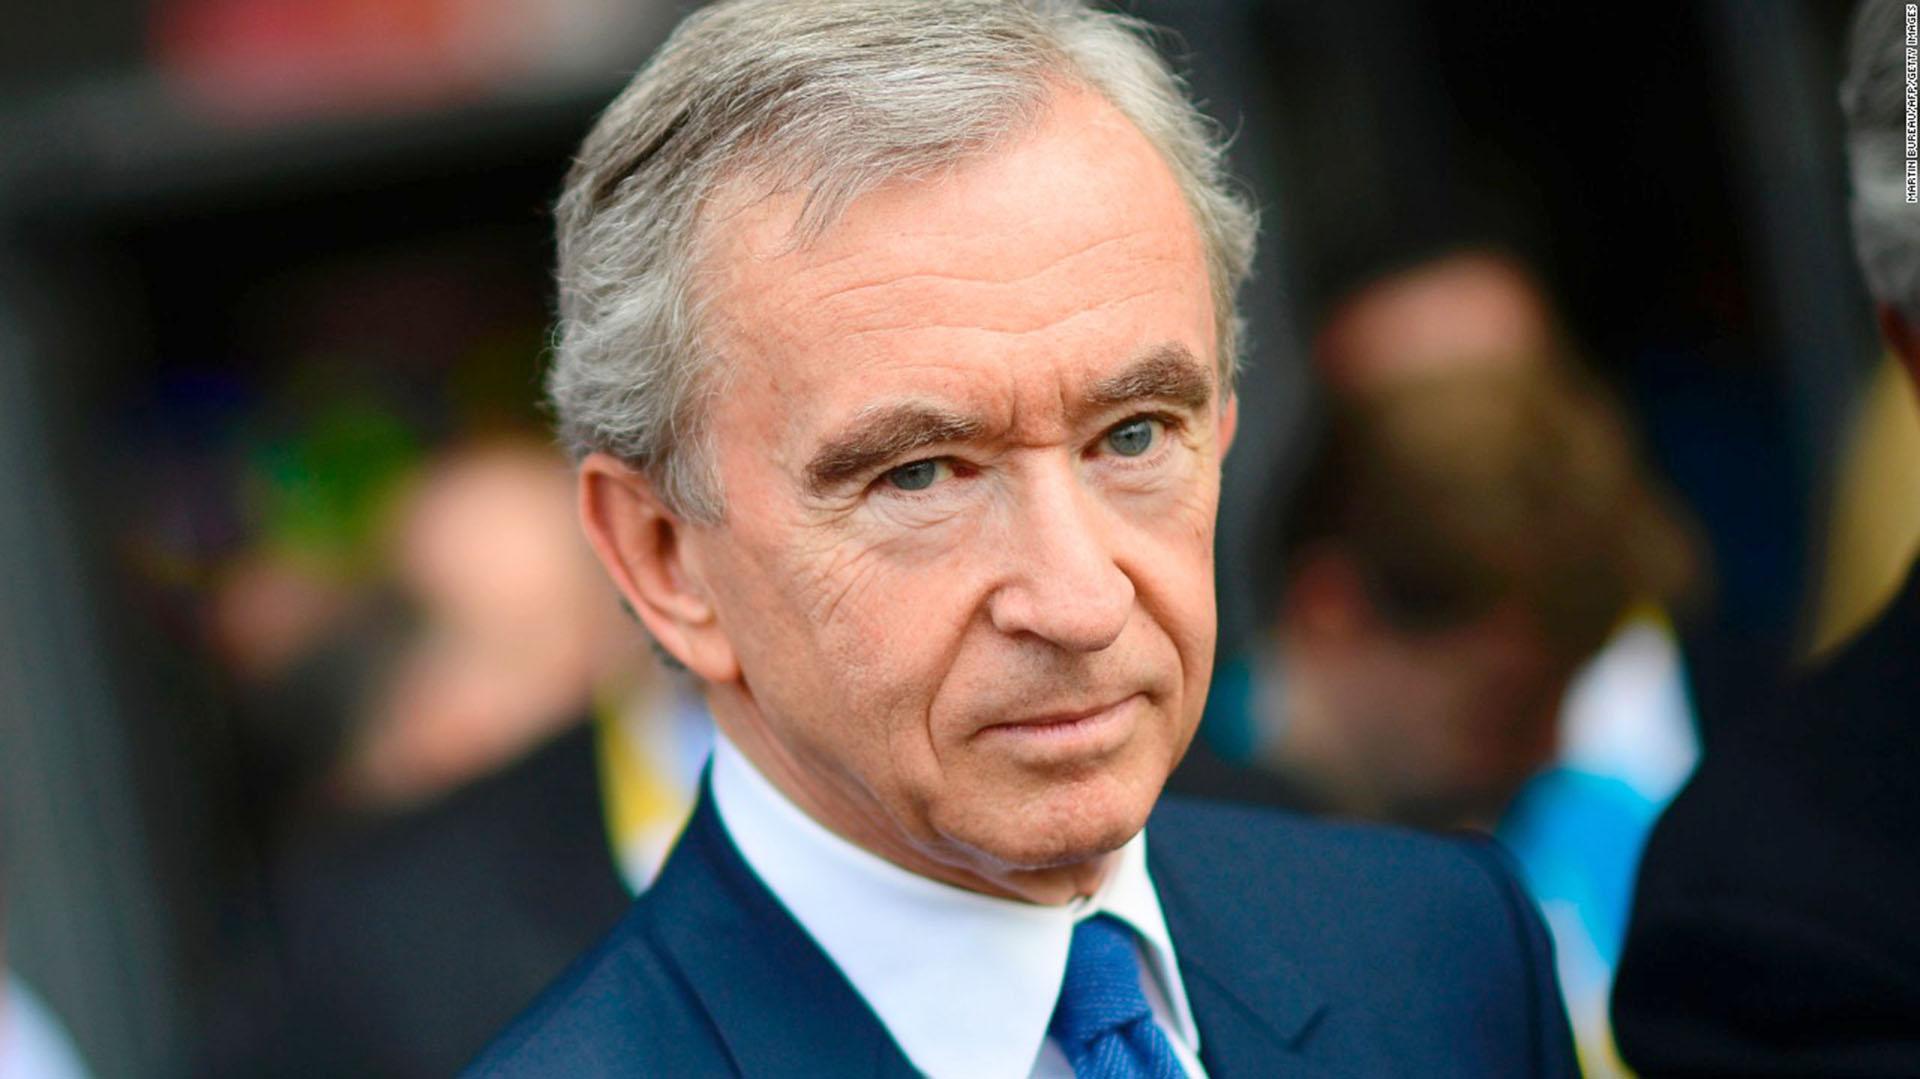 Bernard Arnault, francés de 68 años, acumula una fortuna cercana a los 74,6 mil millones de dólares